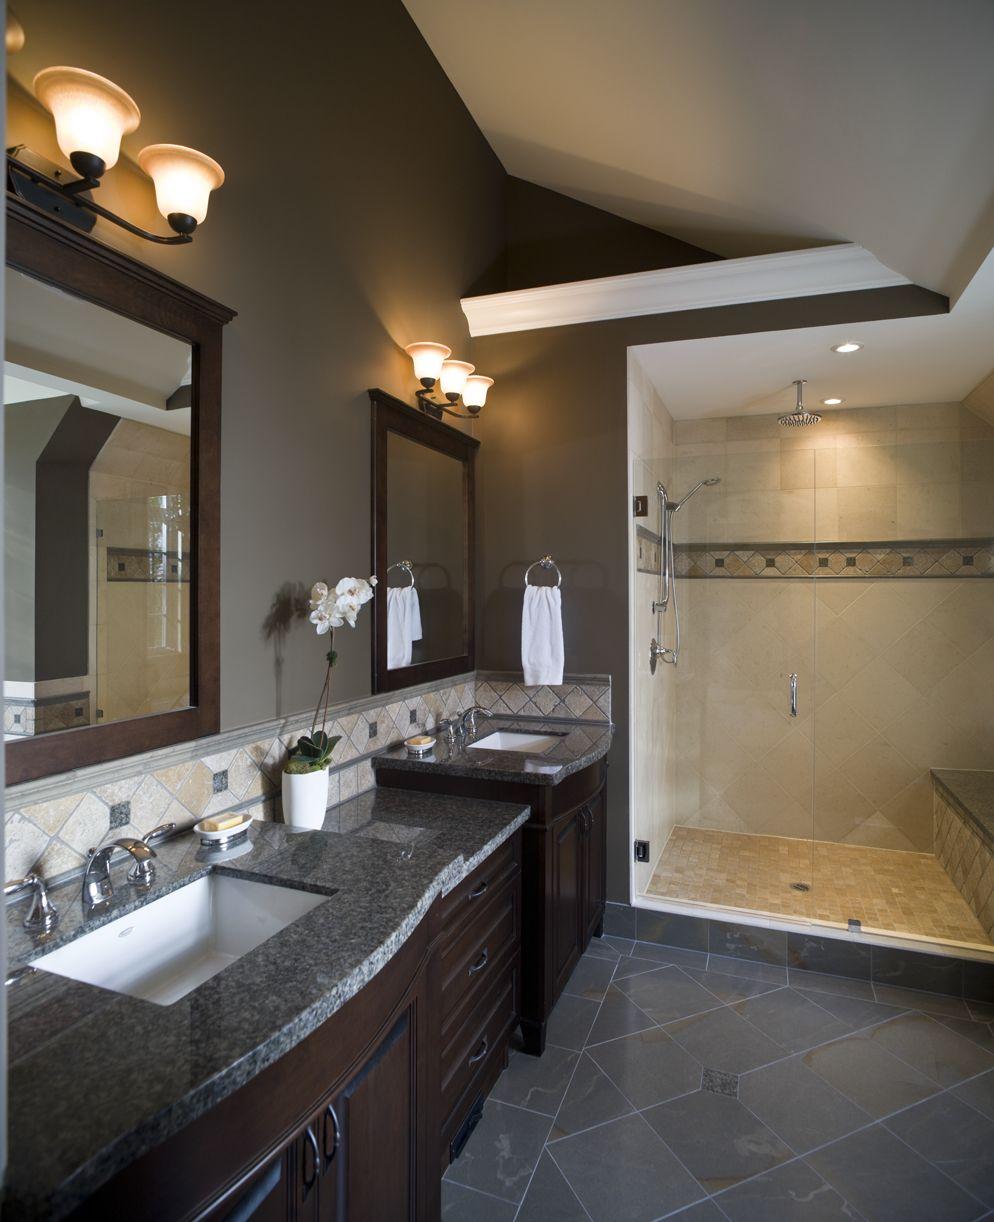 Benefits Of Remodeling Bathrooms Bathrooms Remodel Bathroom Remodel Master Gray Tile Bathroom Floor